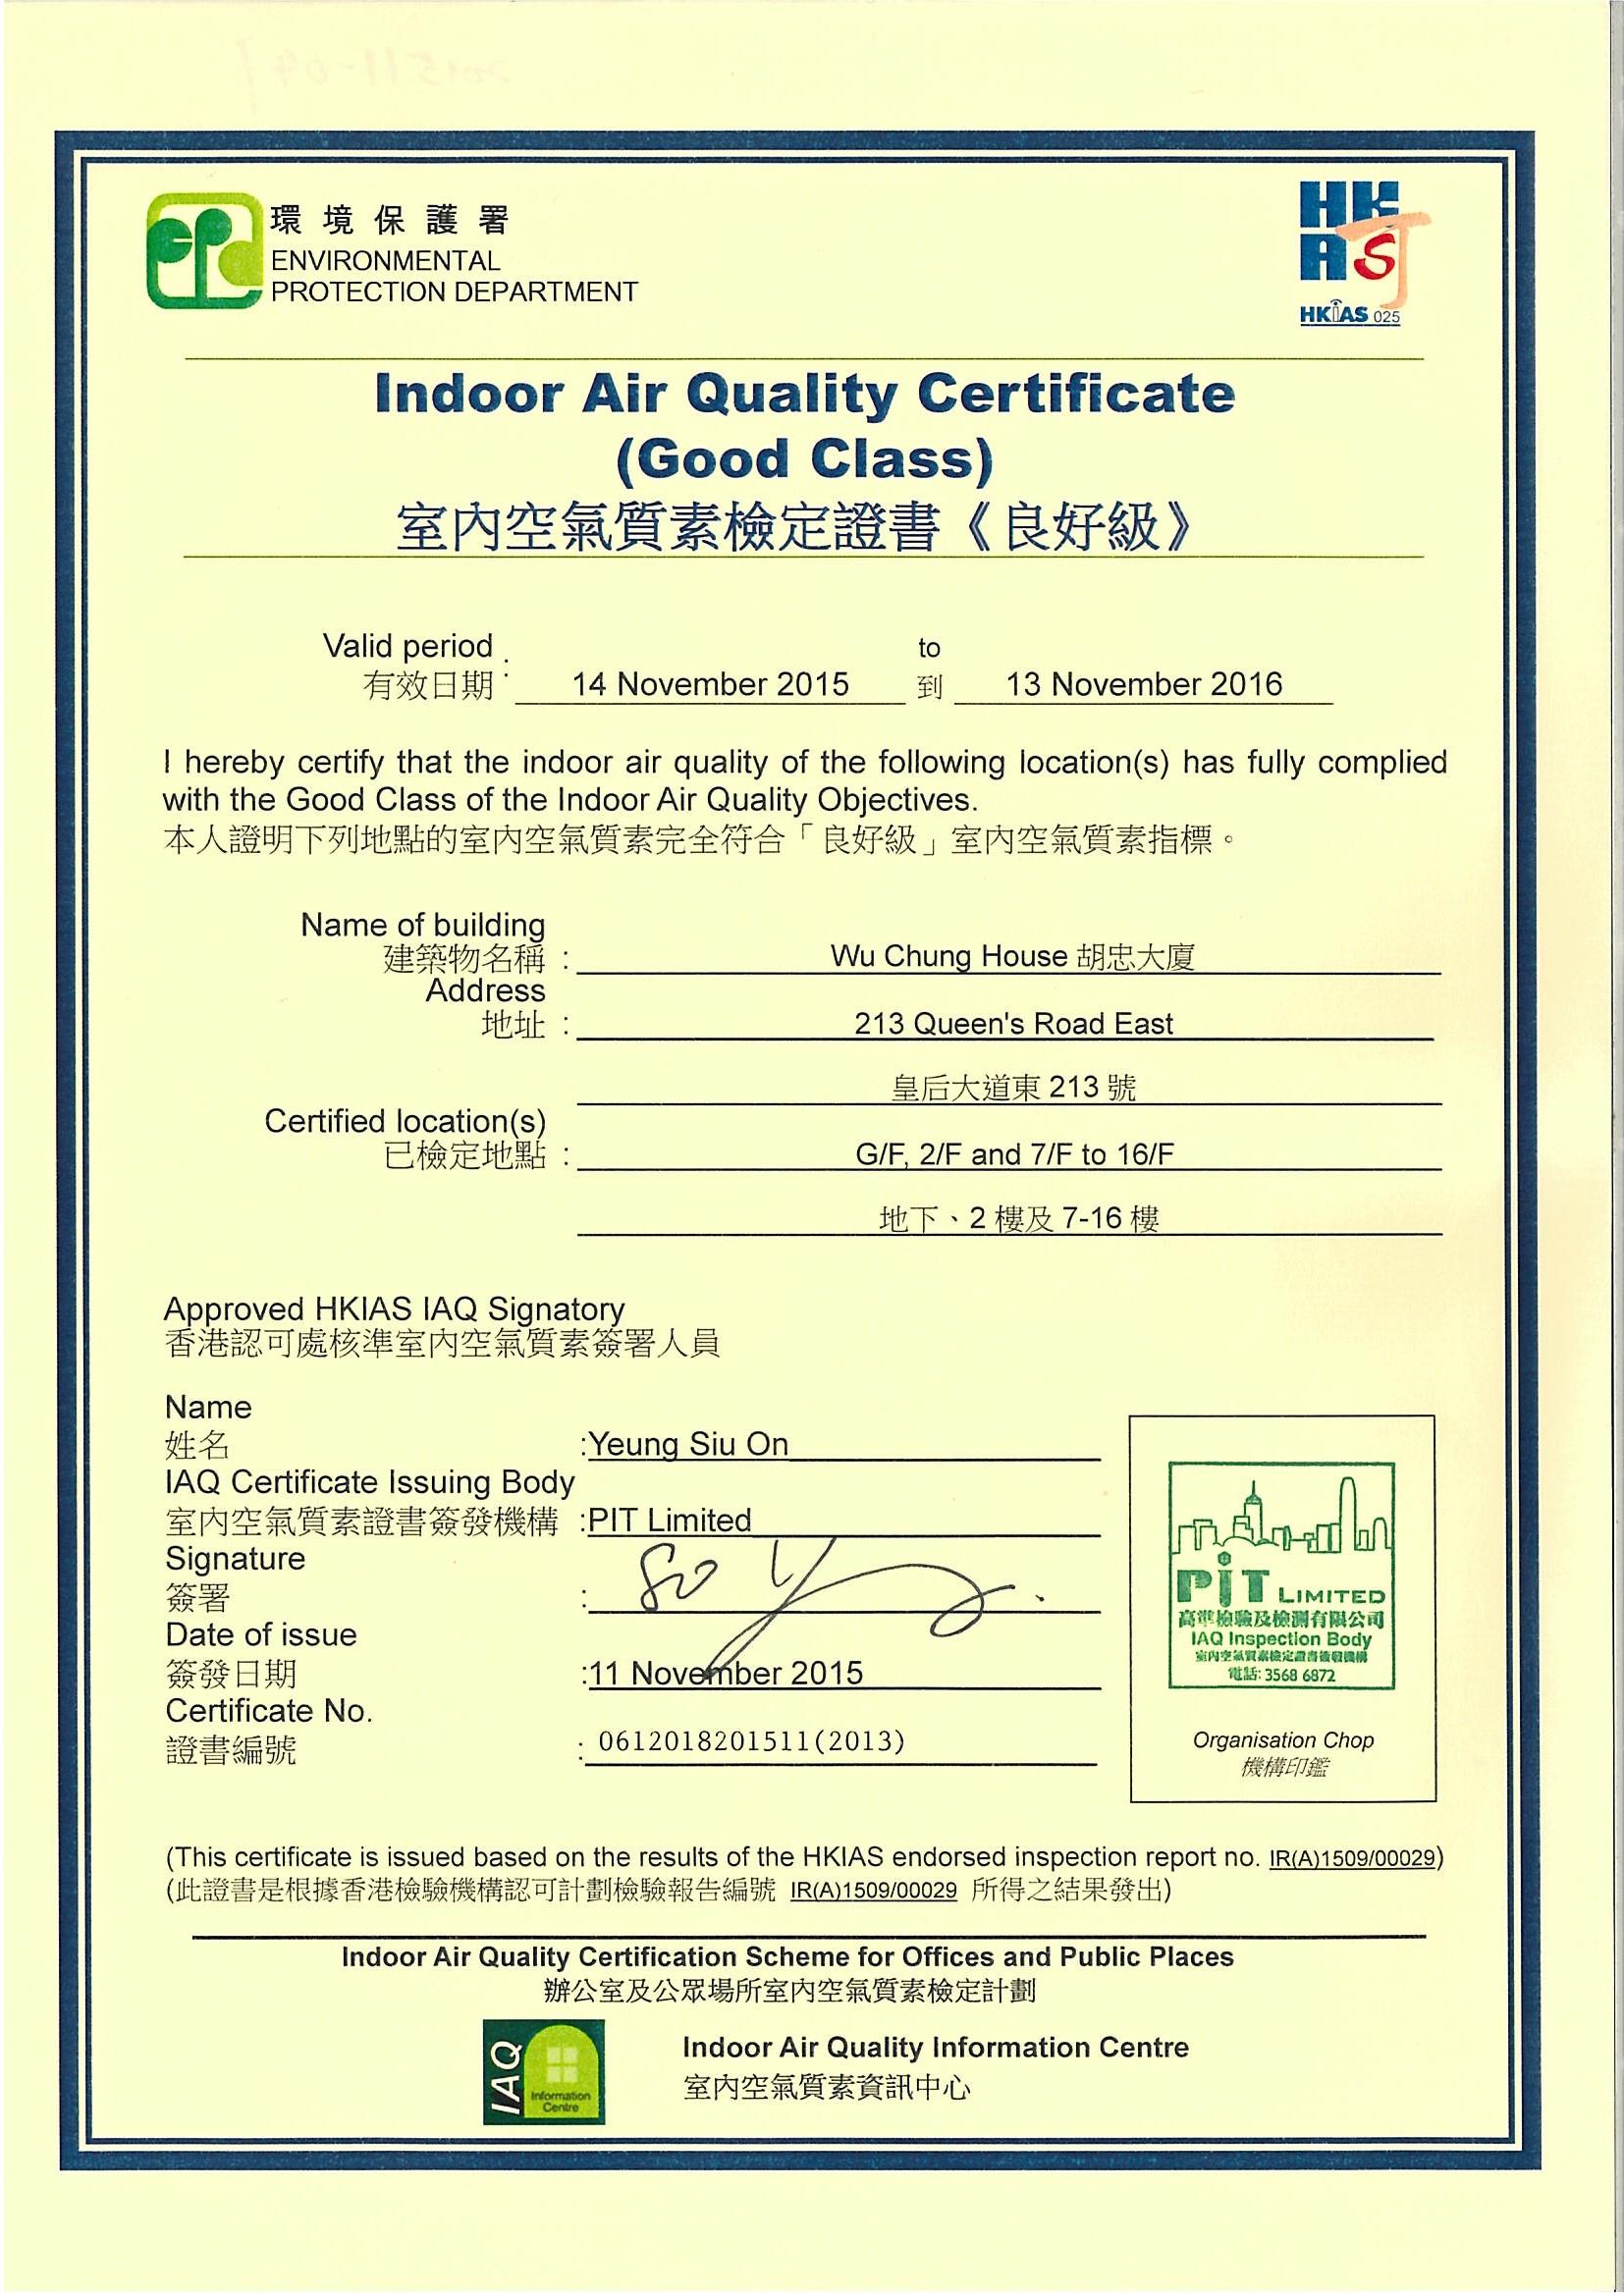 air indoor certificate swd scheme iaq offices certification department social premises report hk